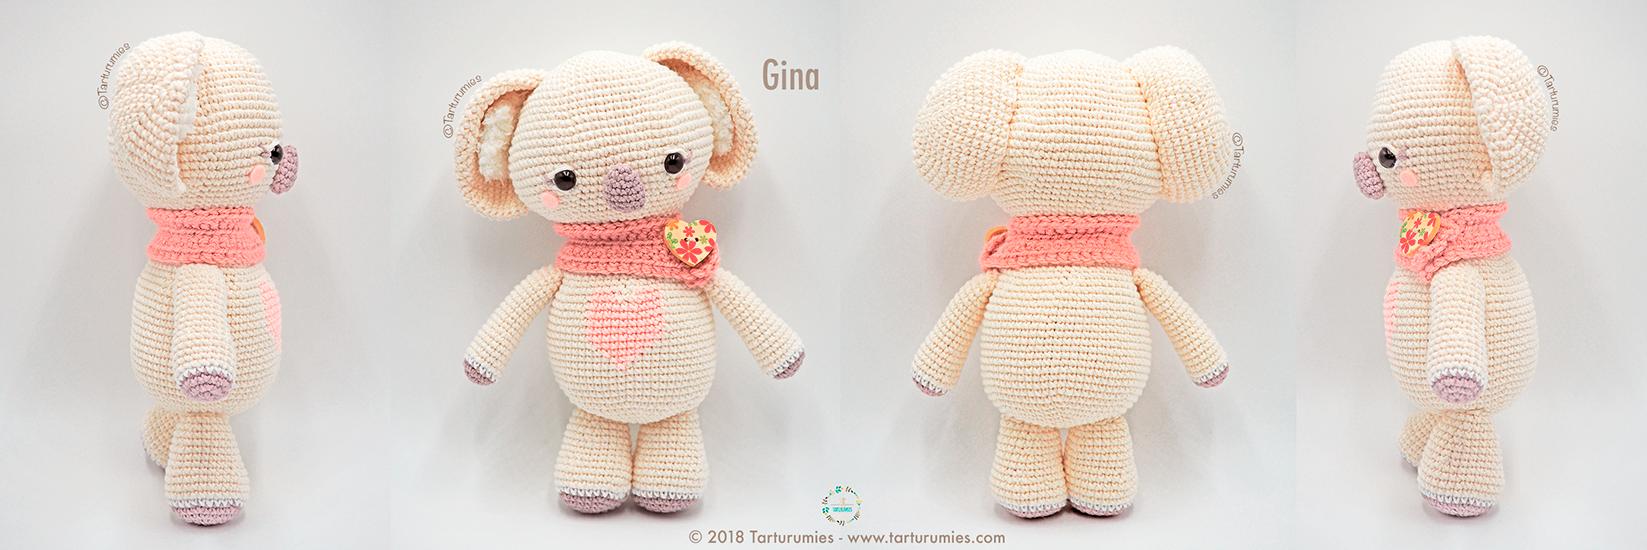 Amigurumi Patrón: Koalas San Valentín – Gina y Dante – Tarturumies